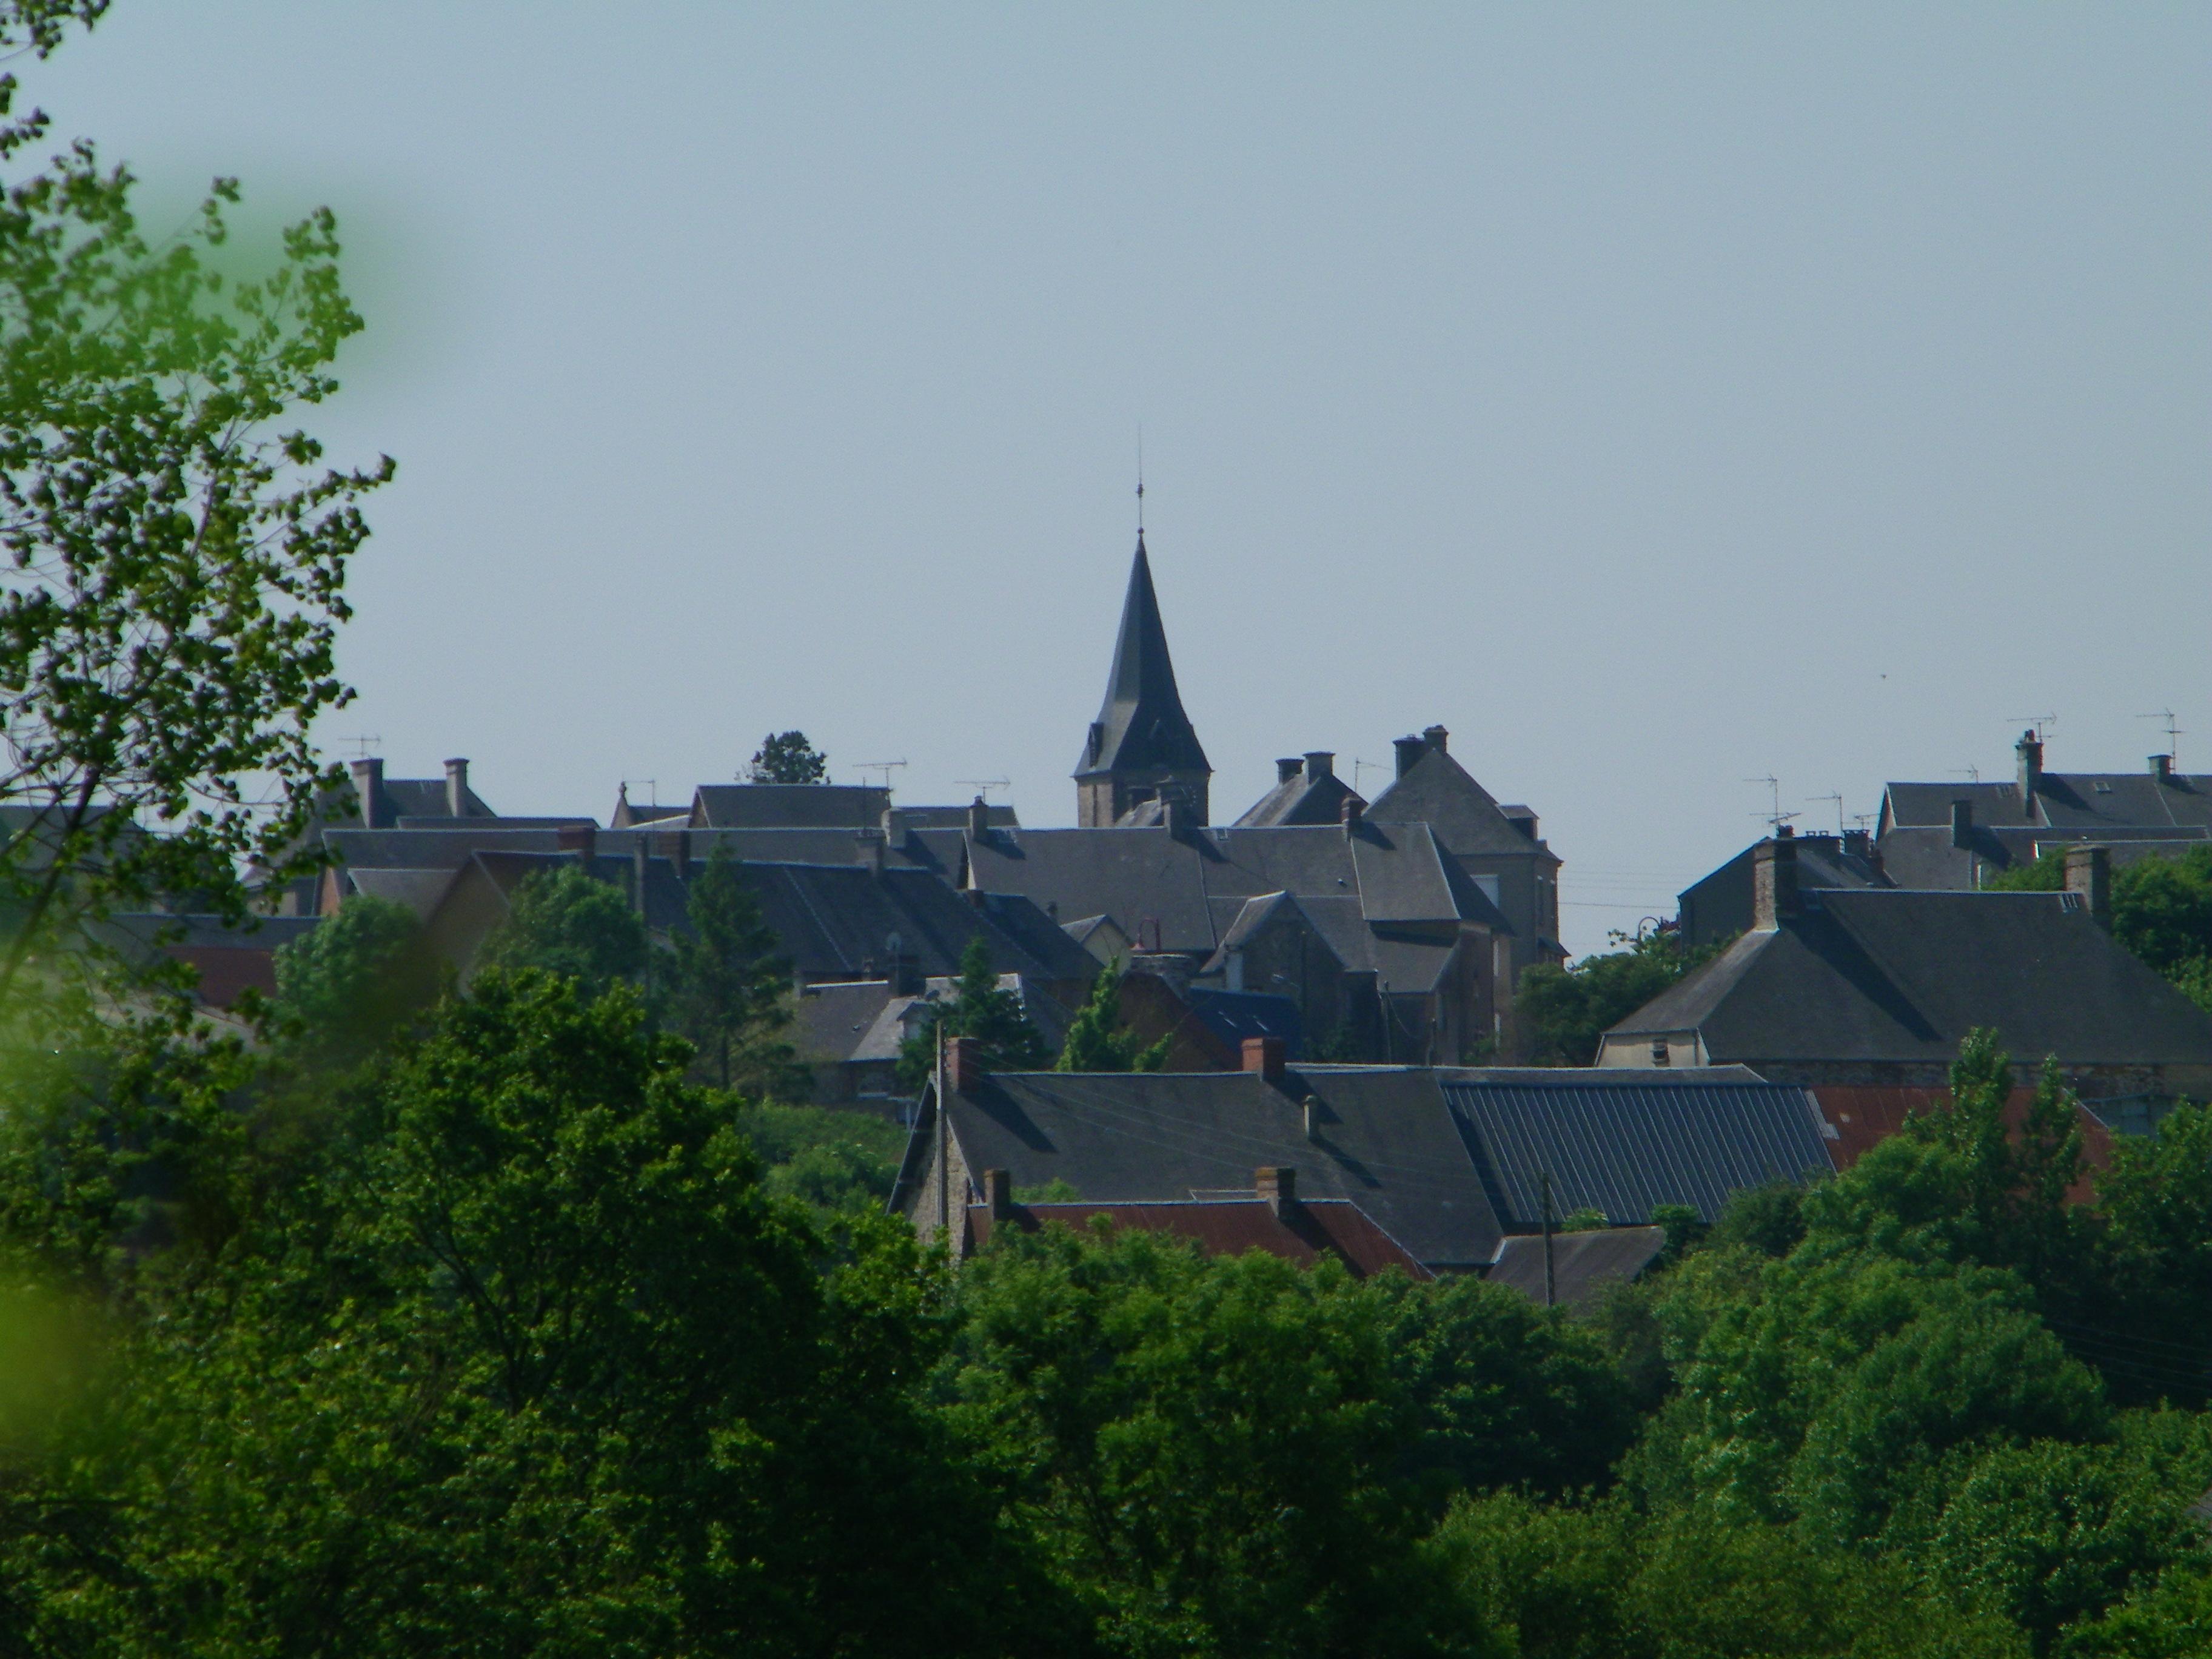 Cerisy-la-Salle